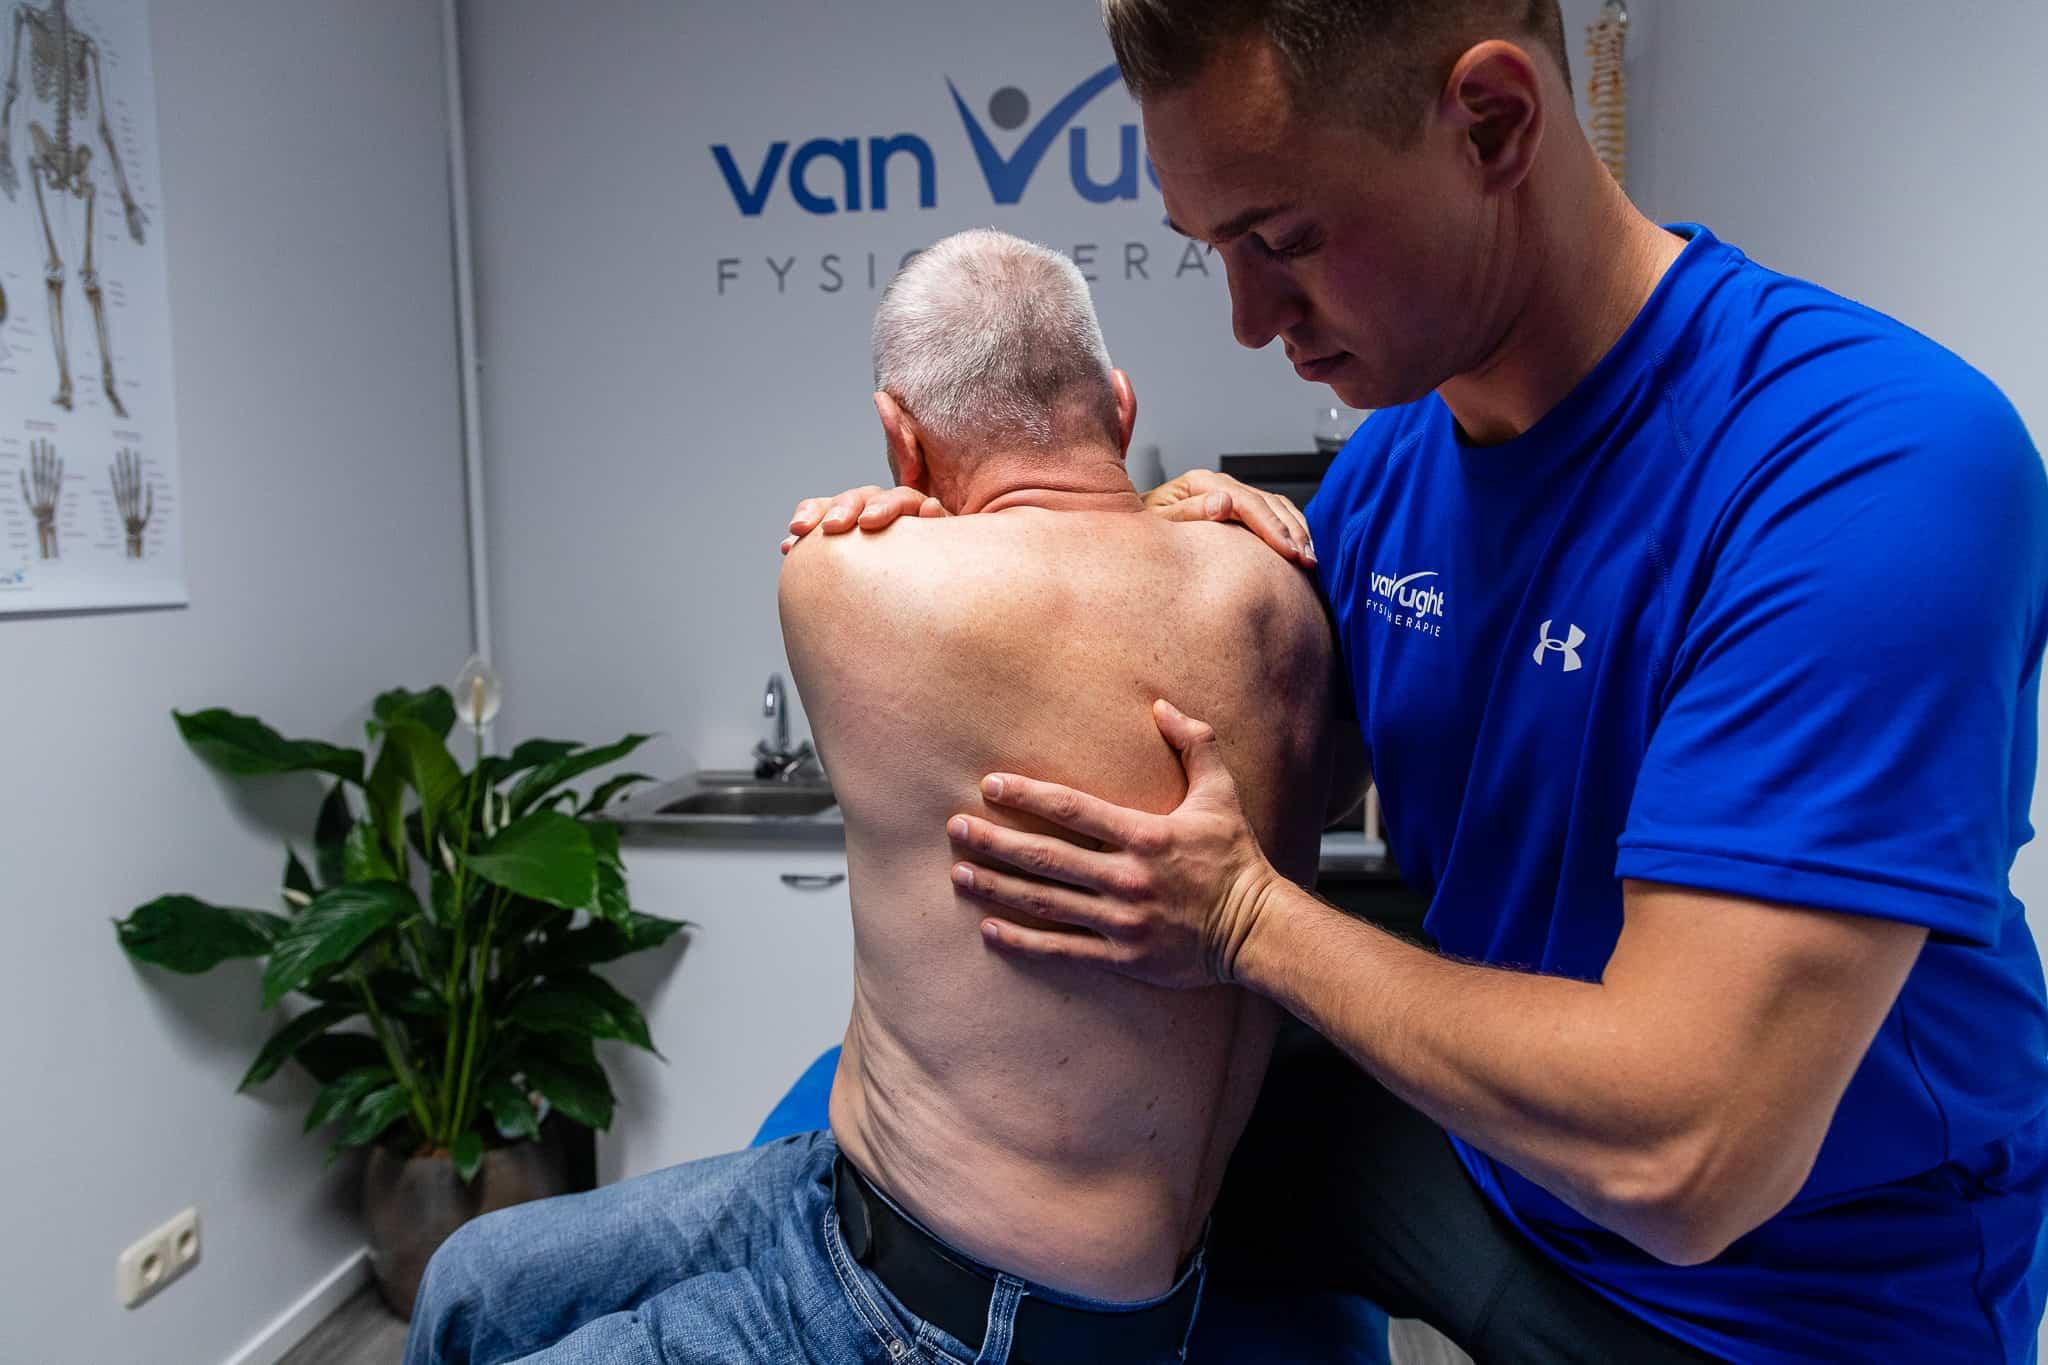 triggerpoint-therapie-van-vught-fysiotherapie